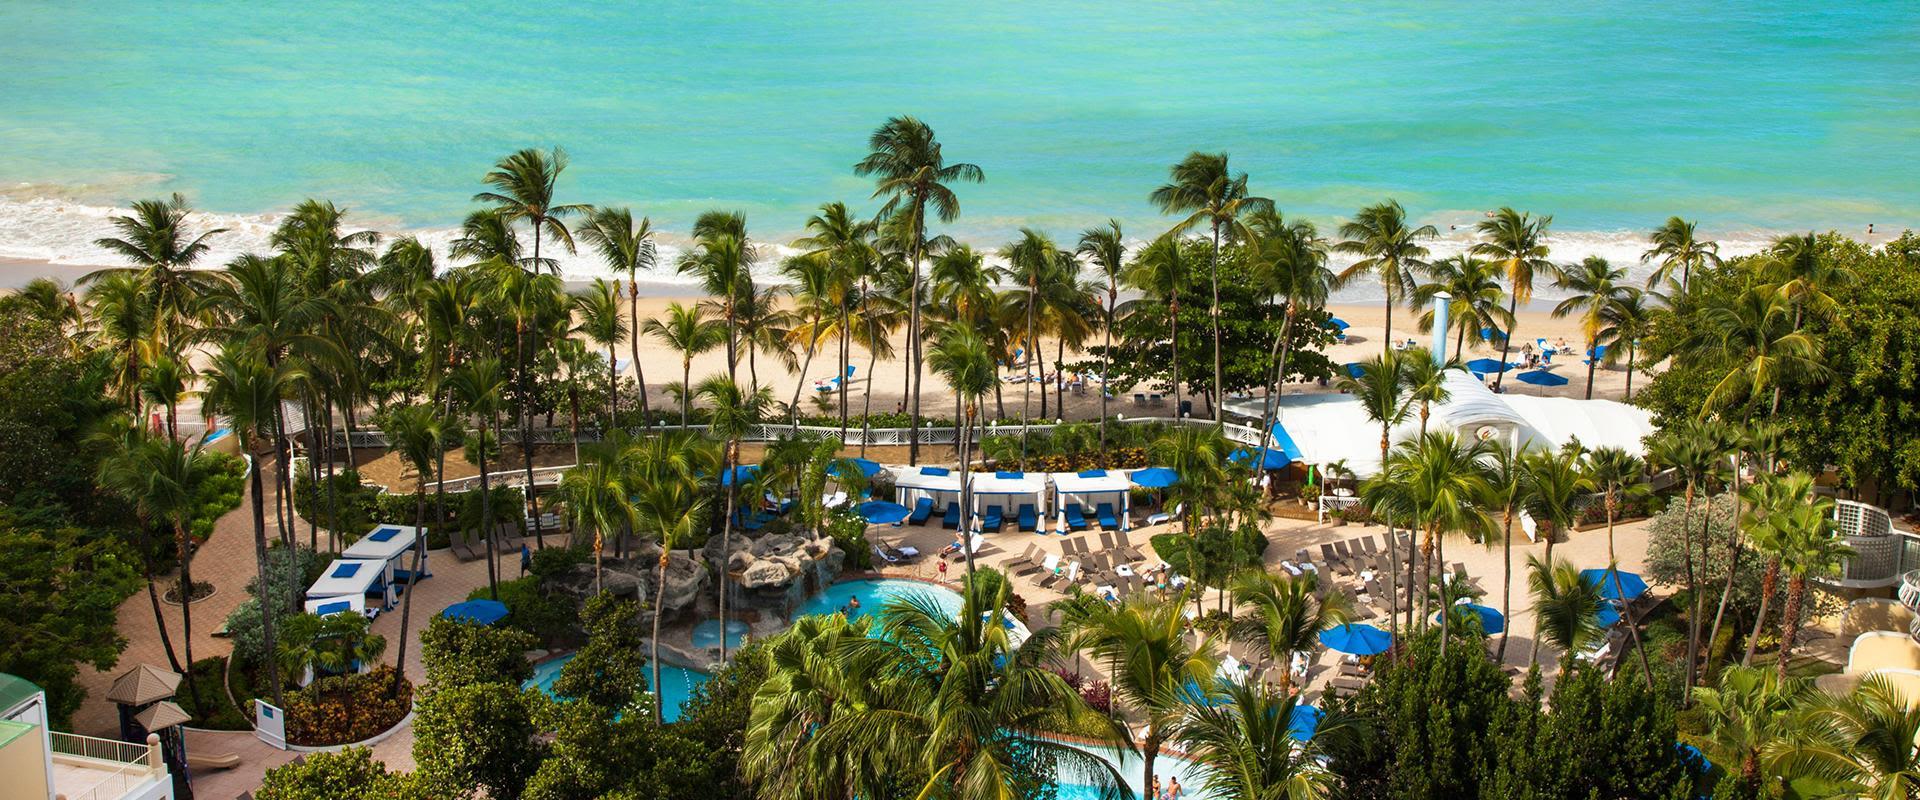 San Juan Resort Beach Area Overview